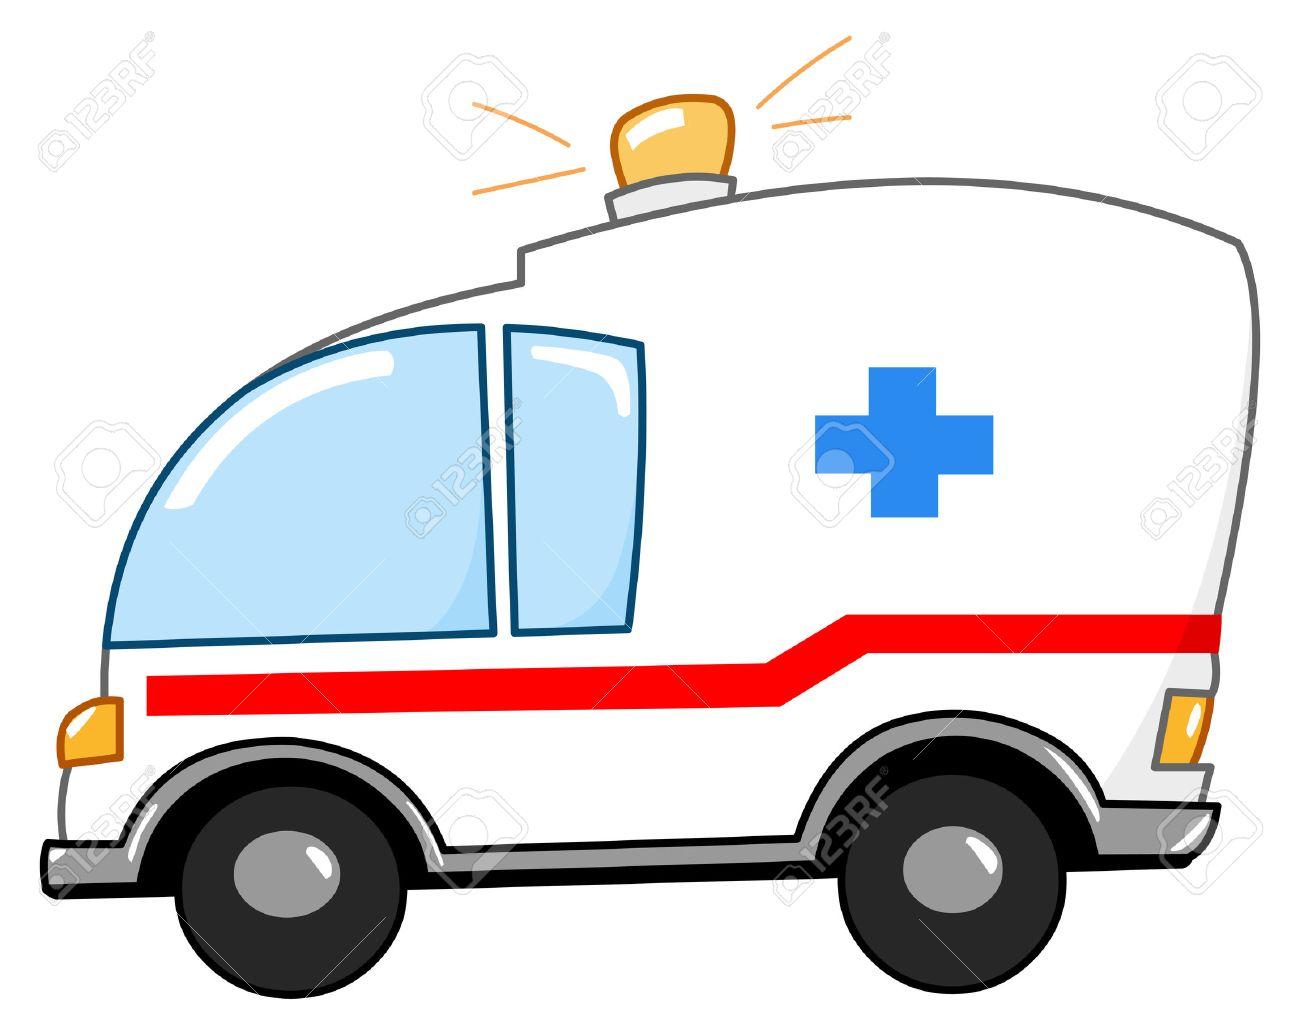 Ambulance Car Drawing Ambulance Cartoon Car